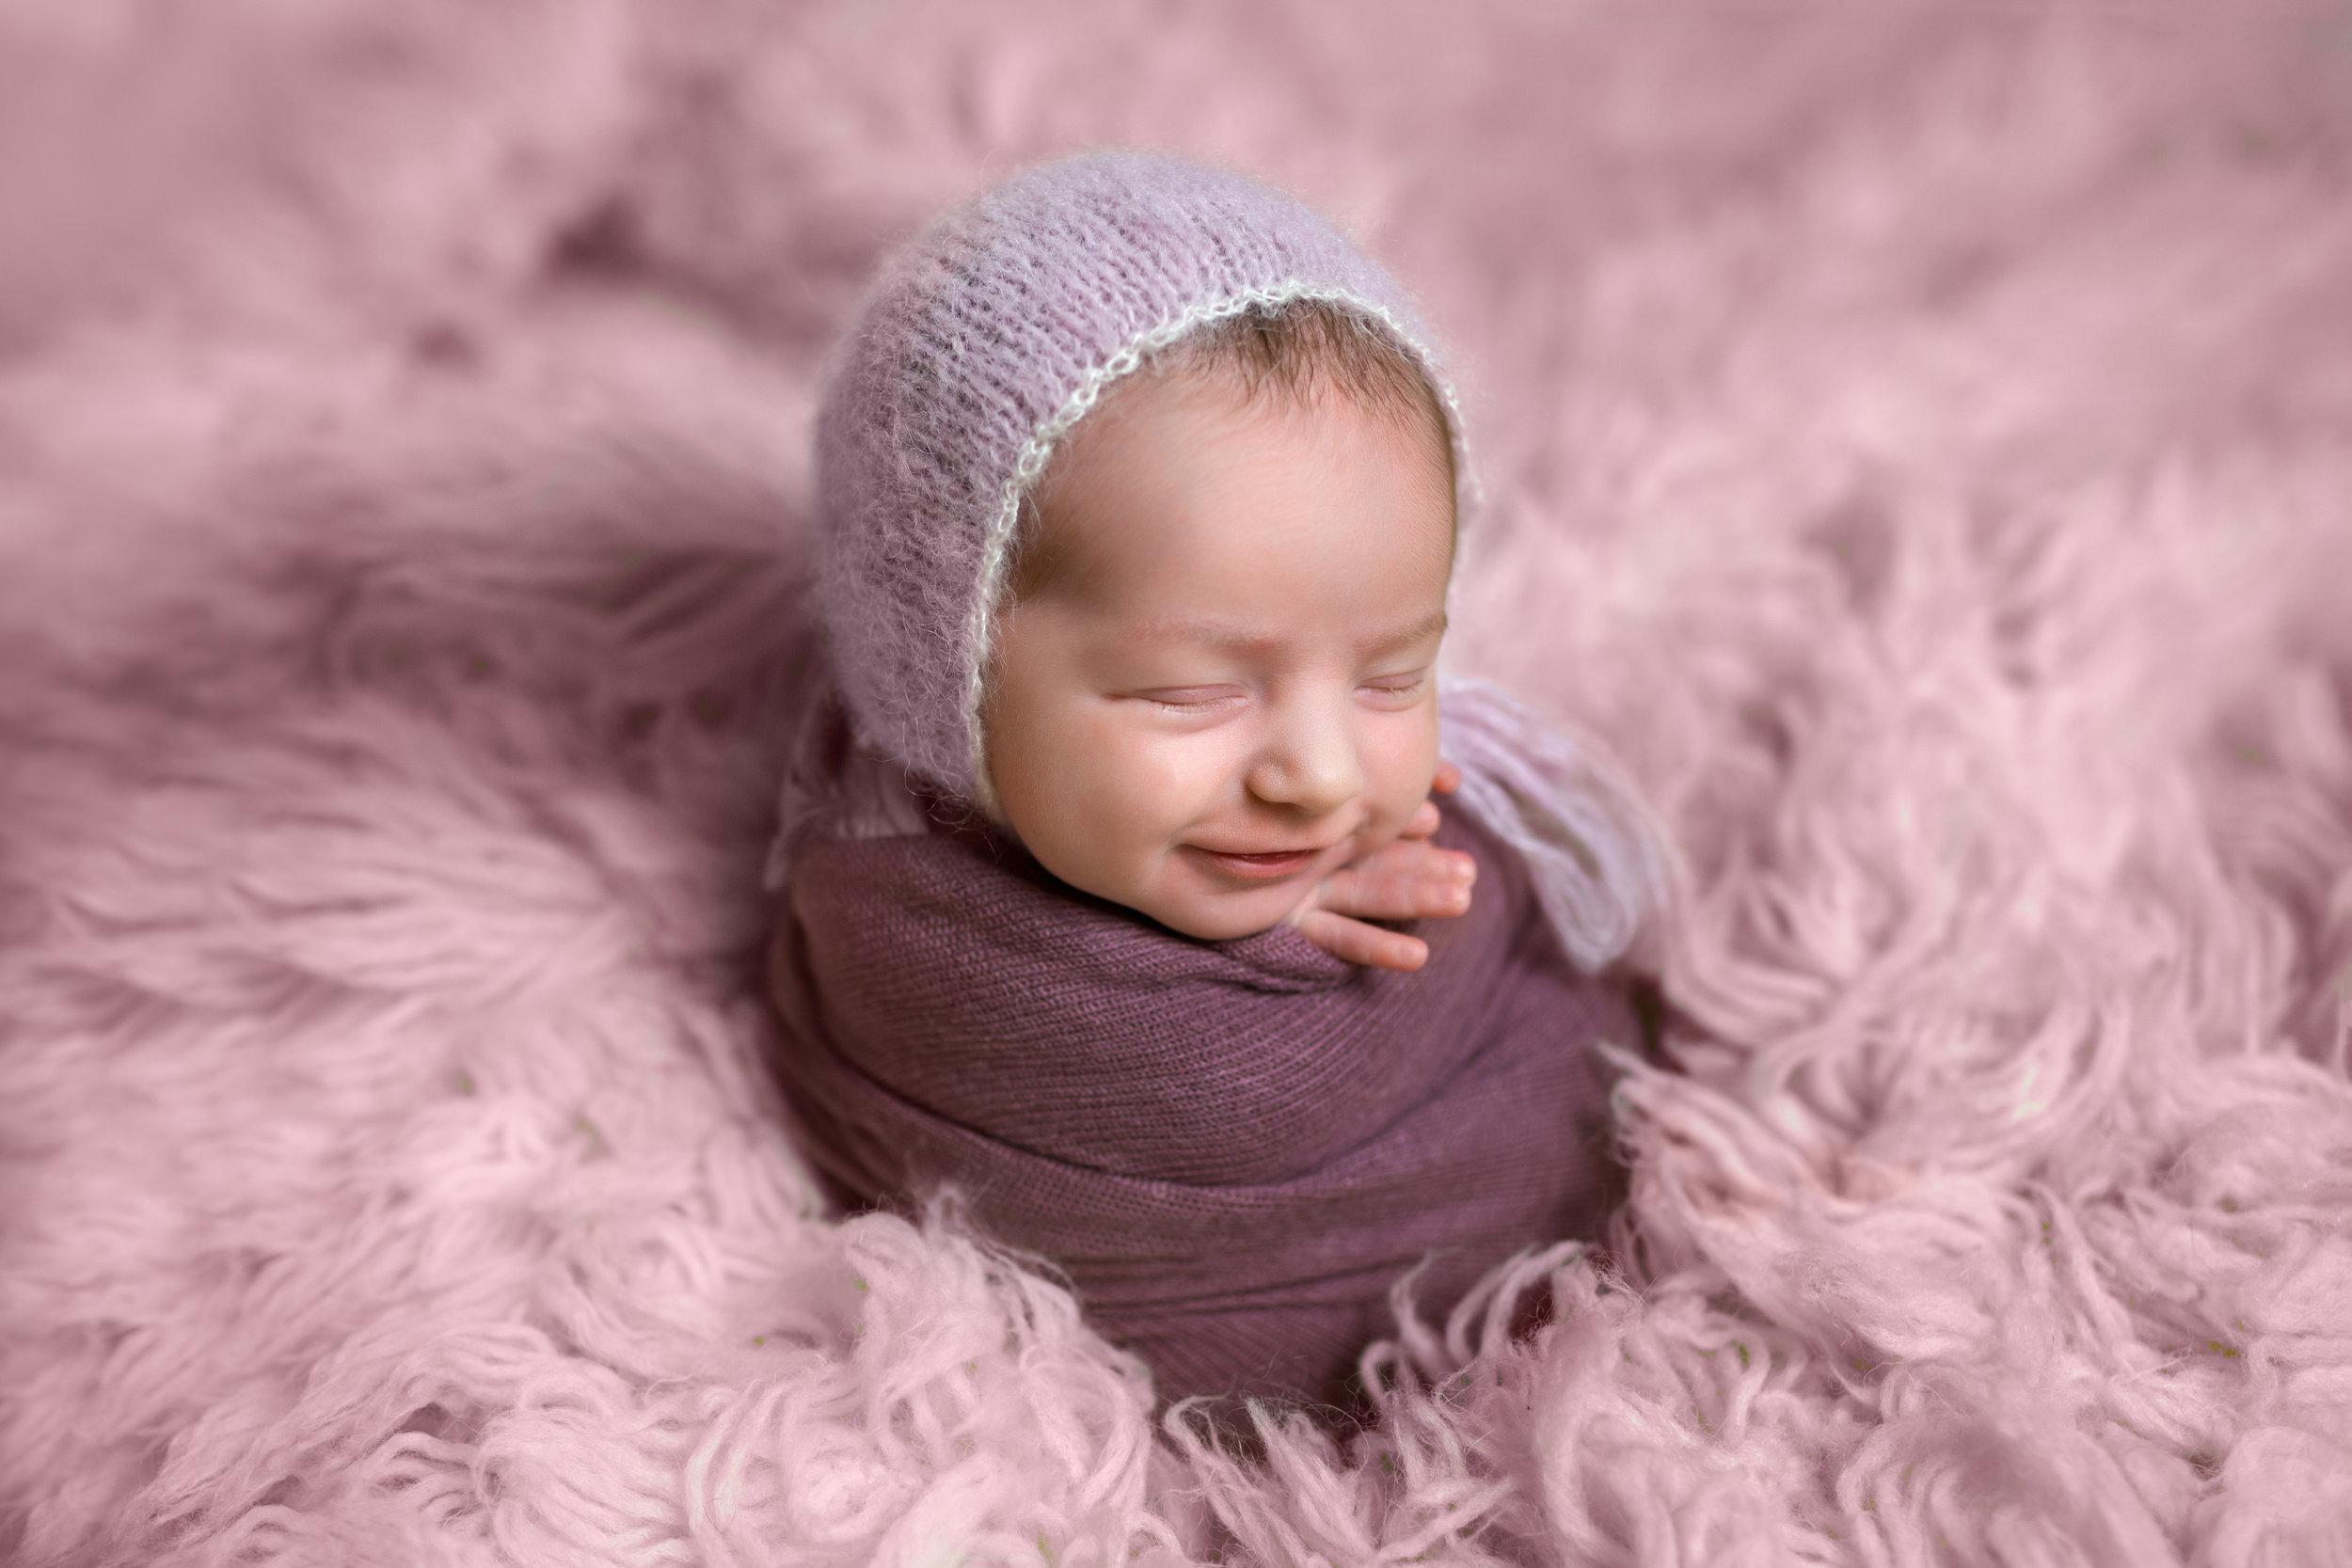 Studio Freyja Newborn Photography in San Diego, CA pricing and products